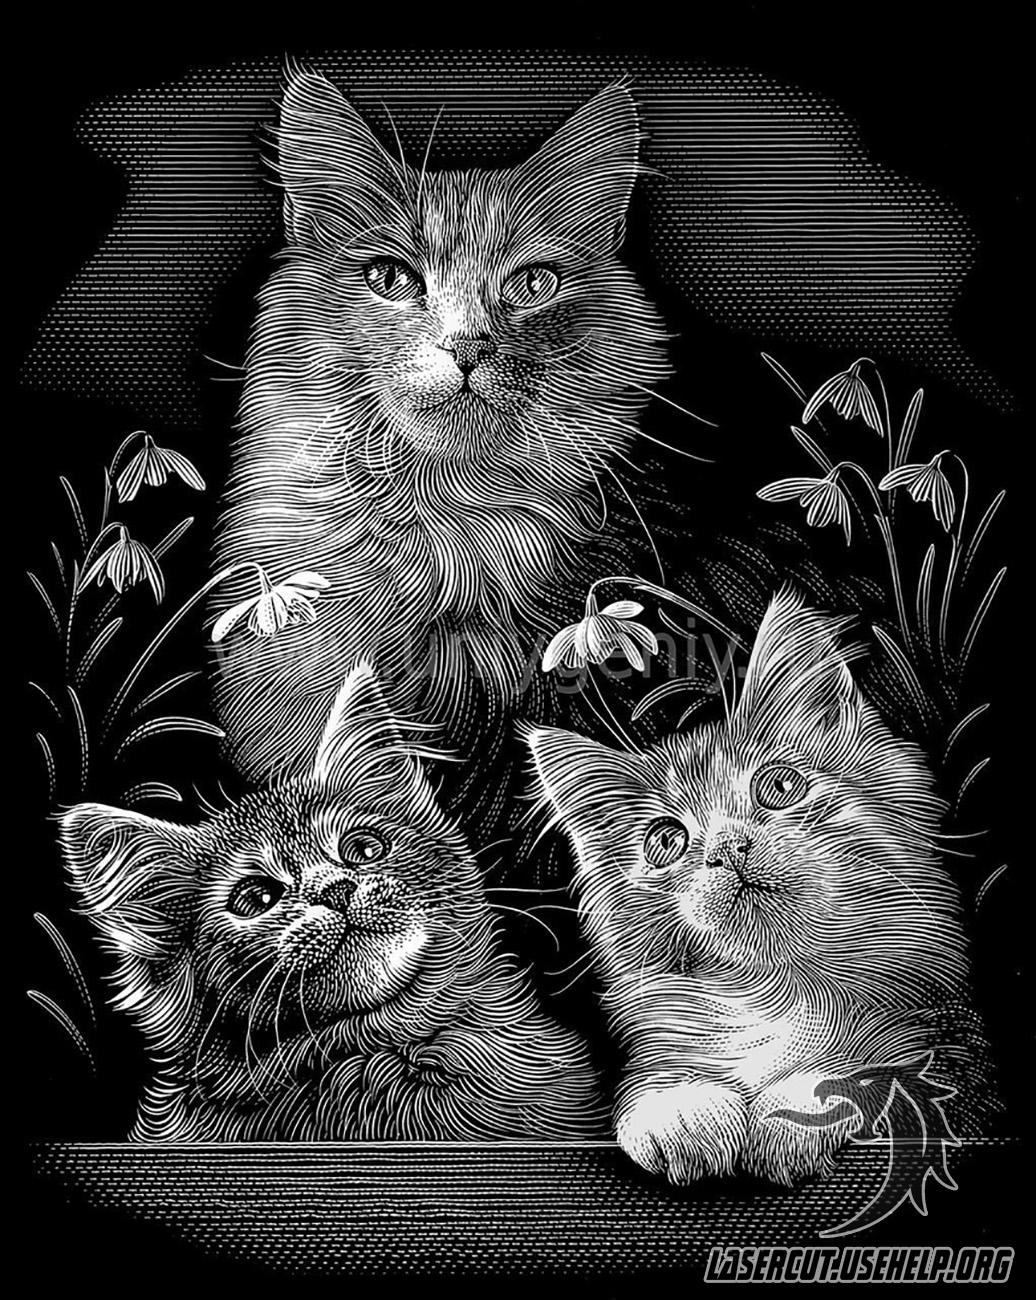 Макет Гравировка Кошка с котятами из фанеры - LaserCut